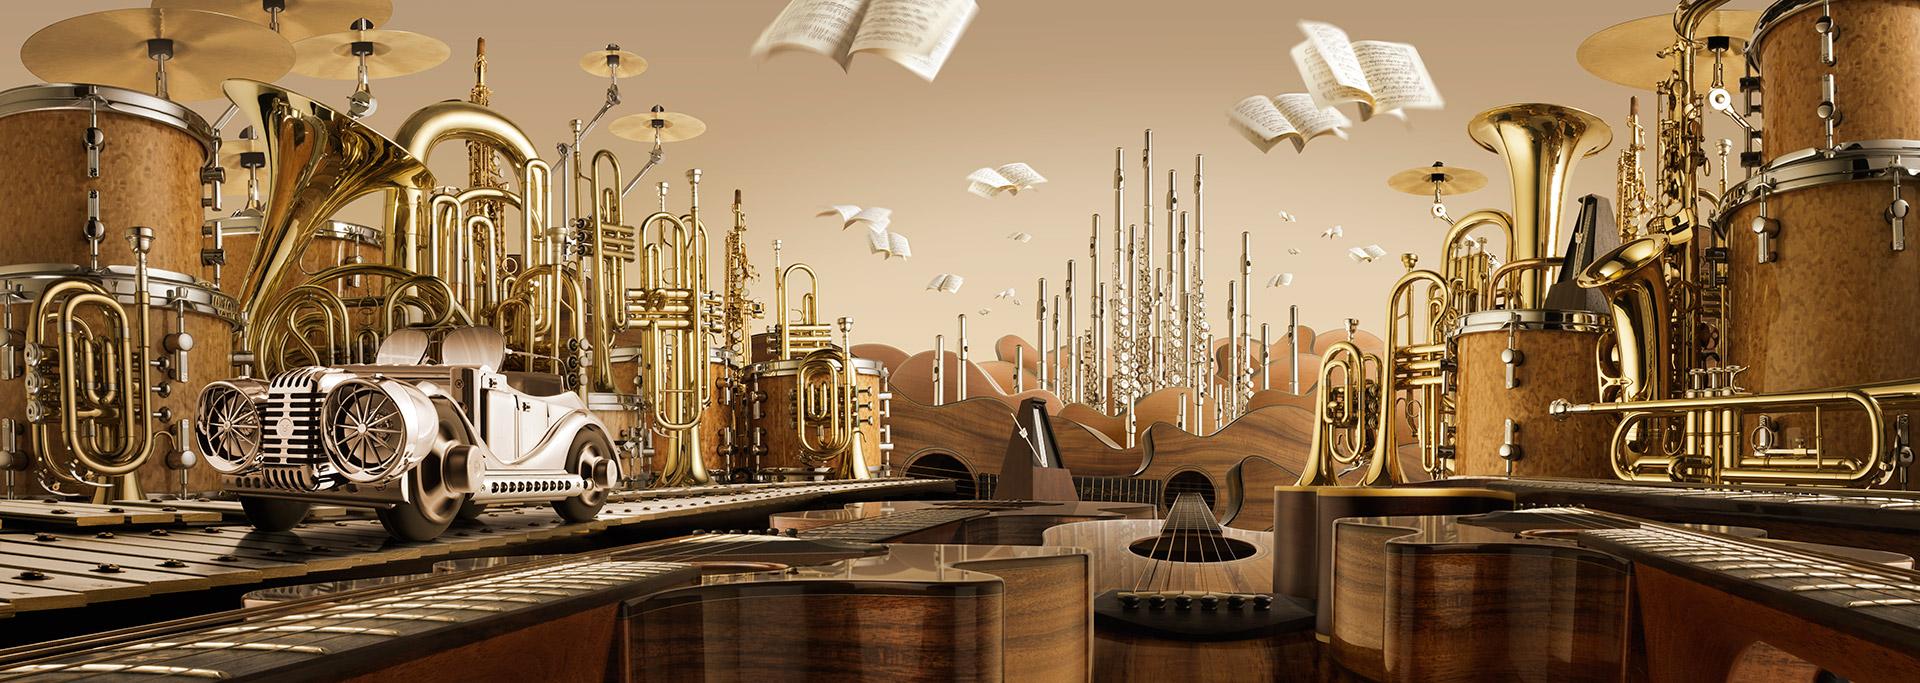 Musical-City